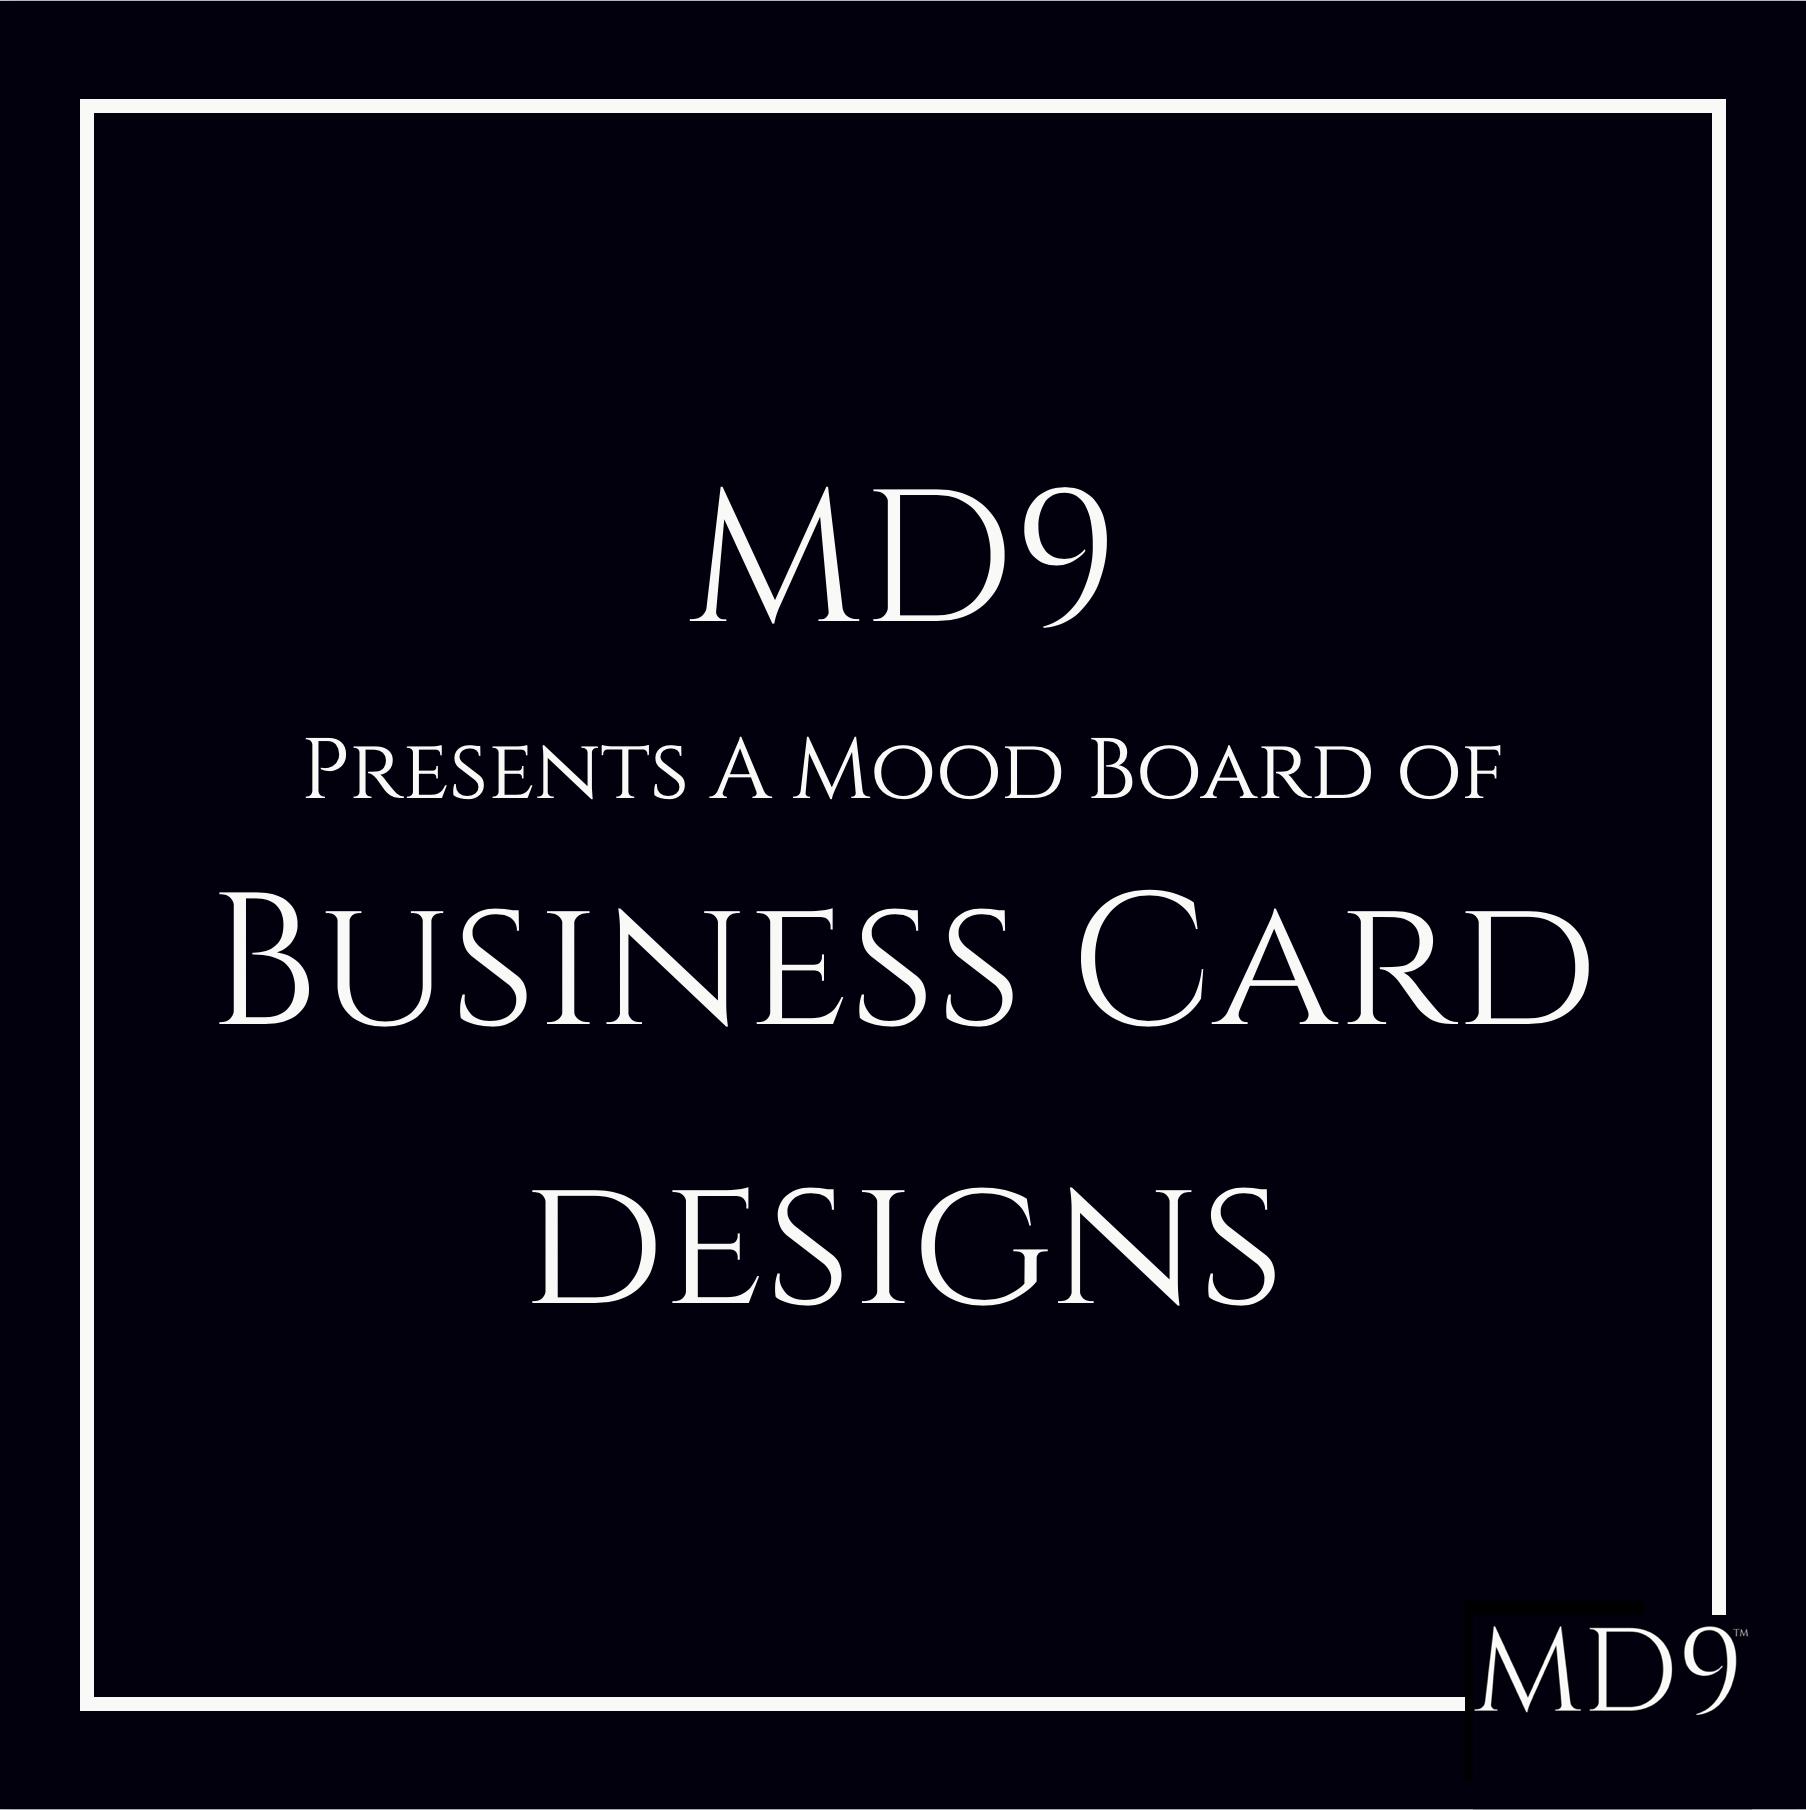 MD9's Design Mood Board – Business Cards